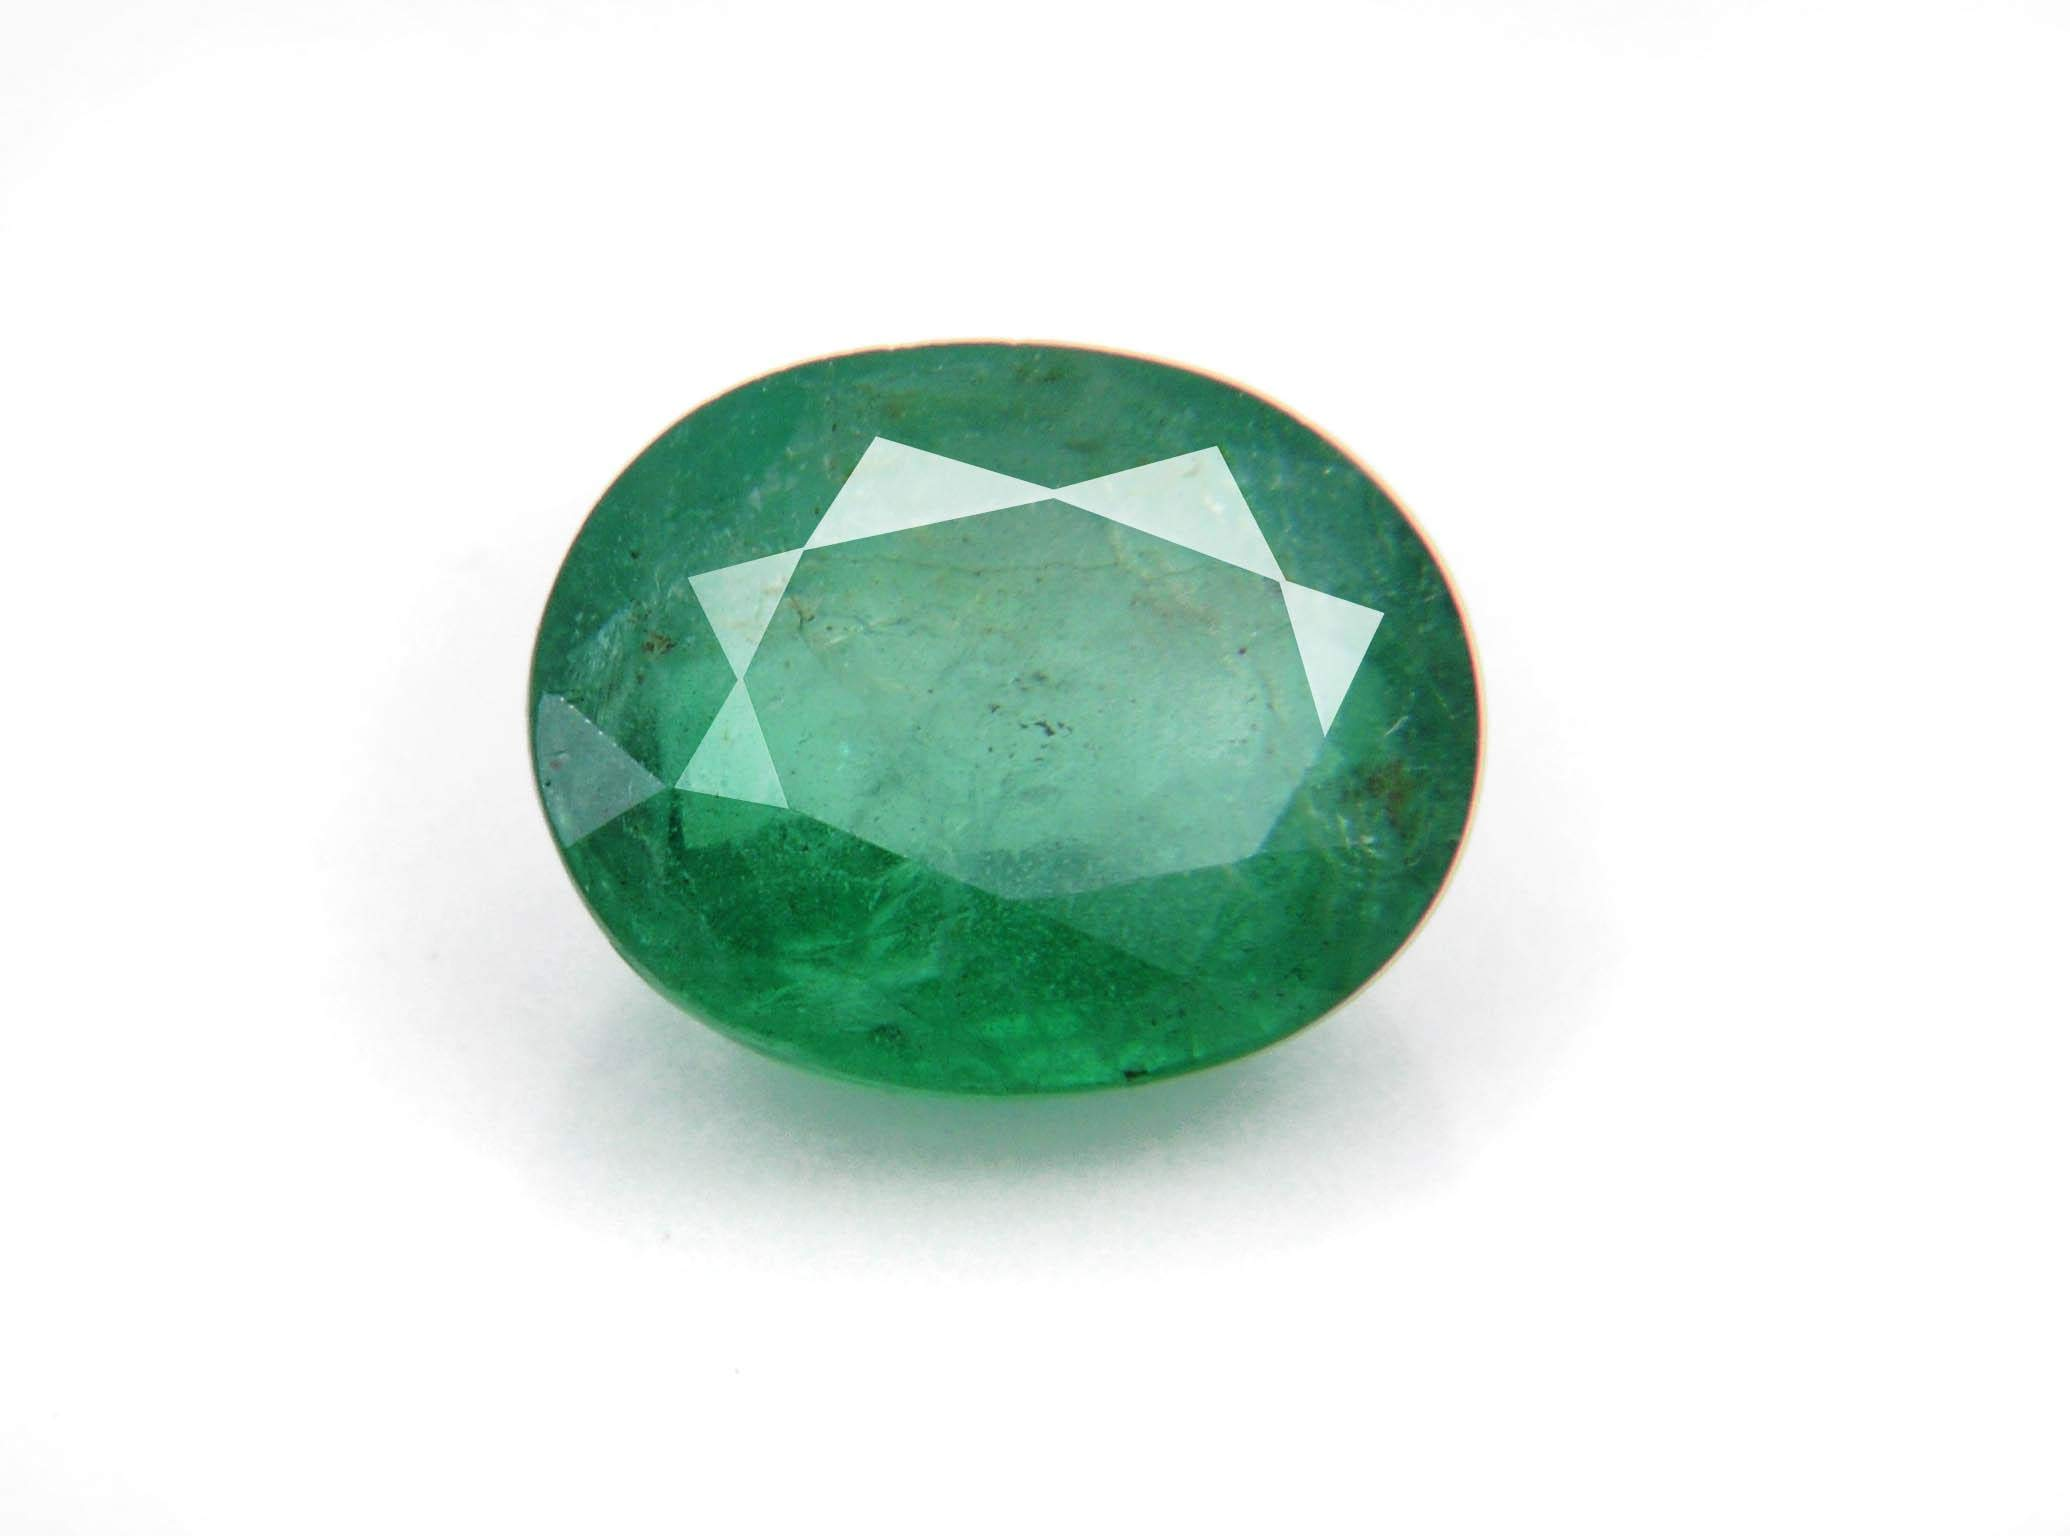 caaa99a85 Faagems Unisex Natural Rubellite Tourmaline Gemstone Price in UAE ...